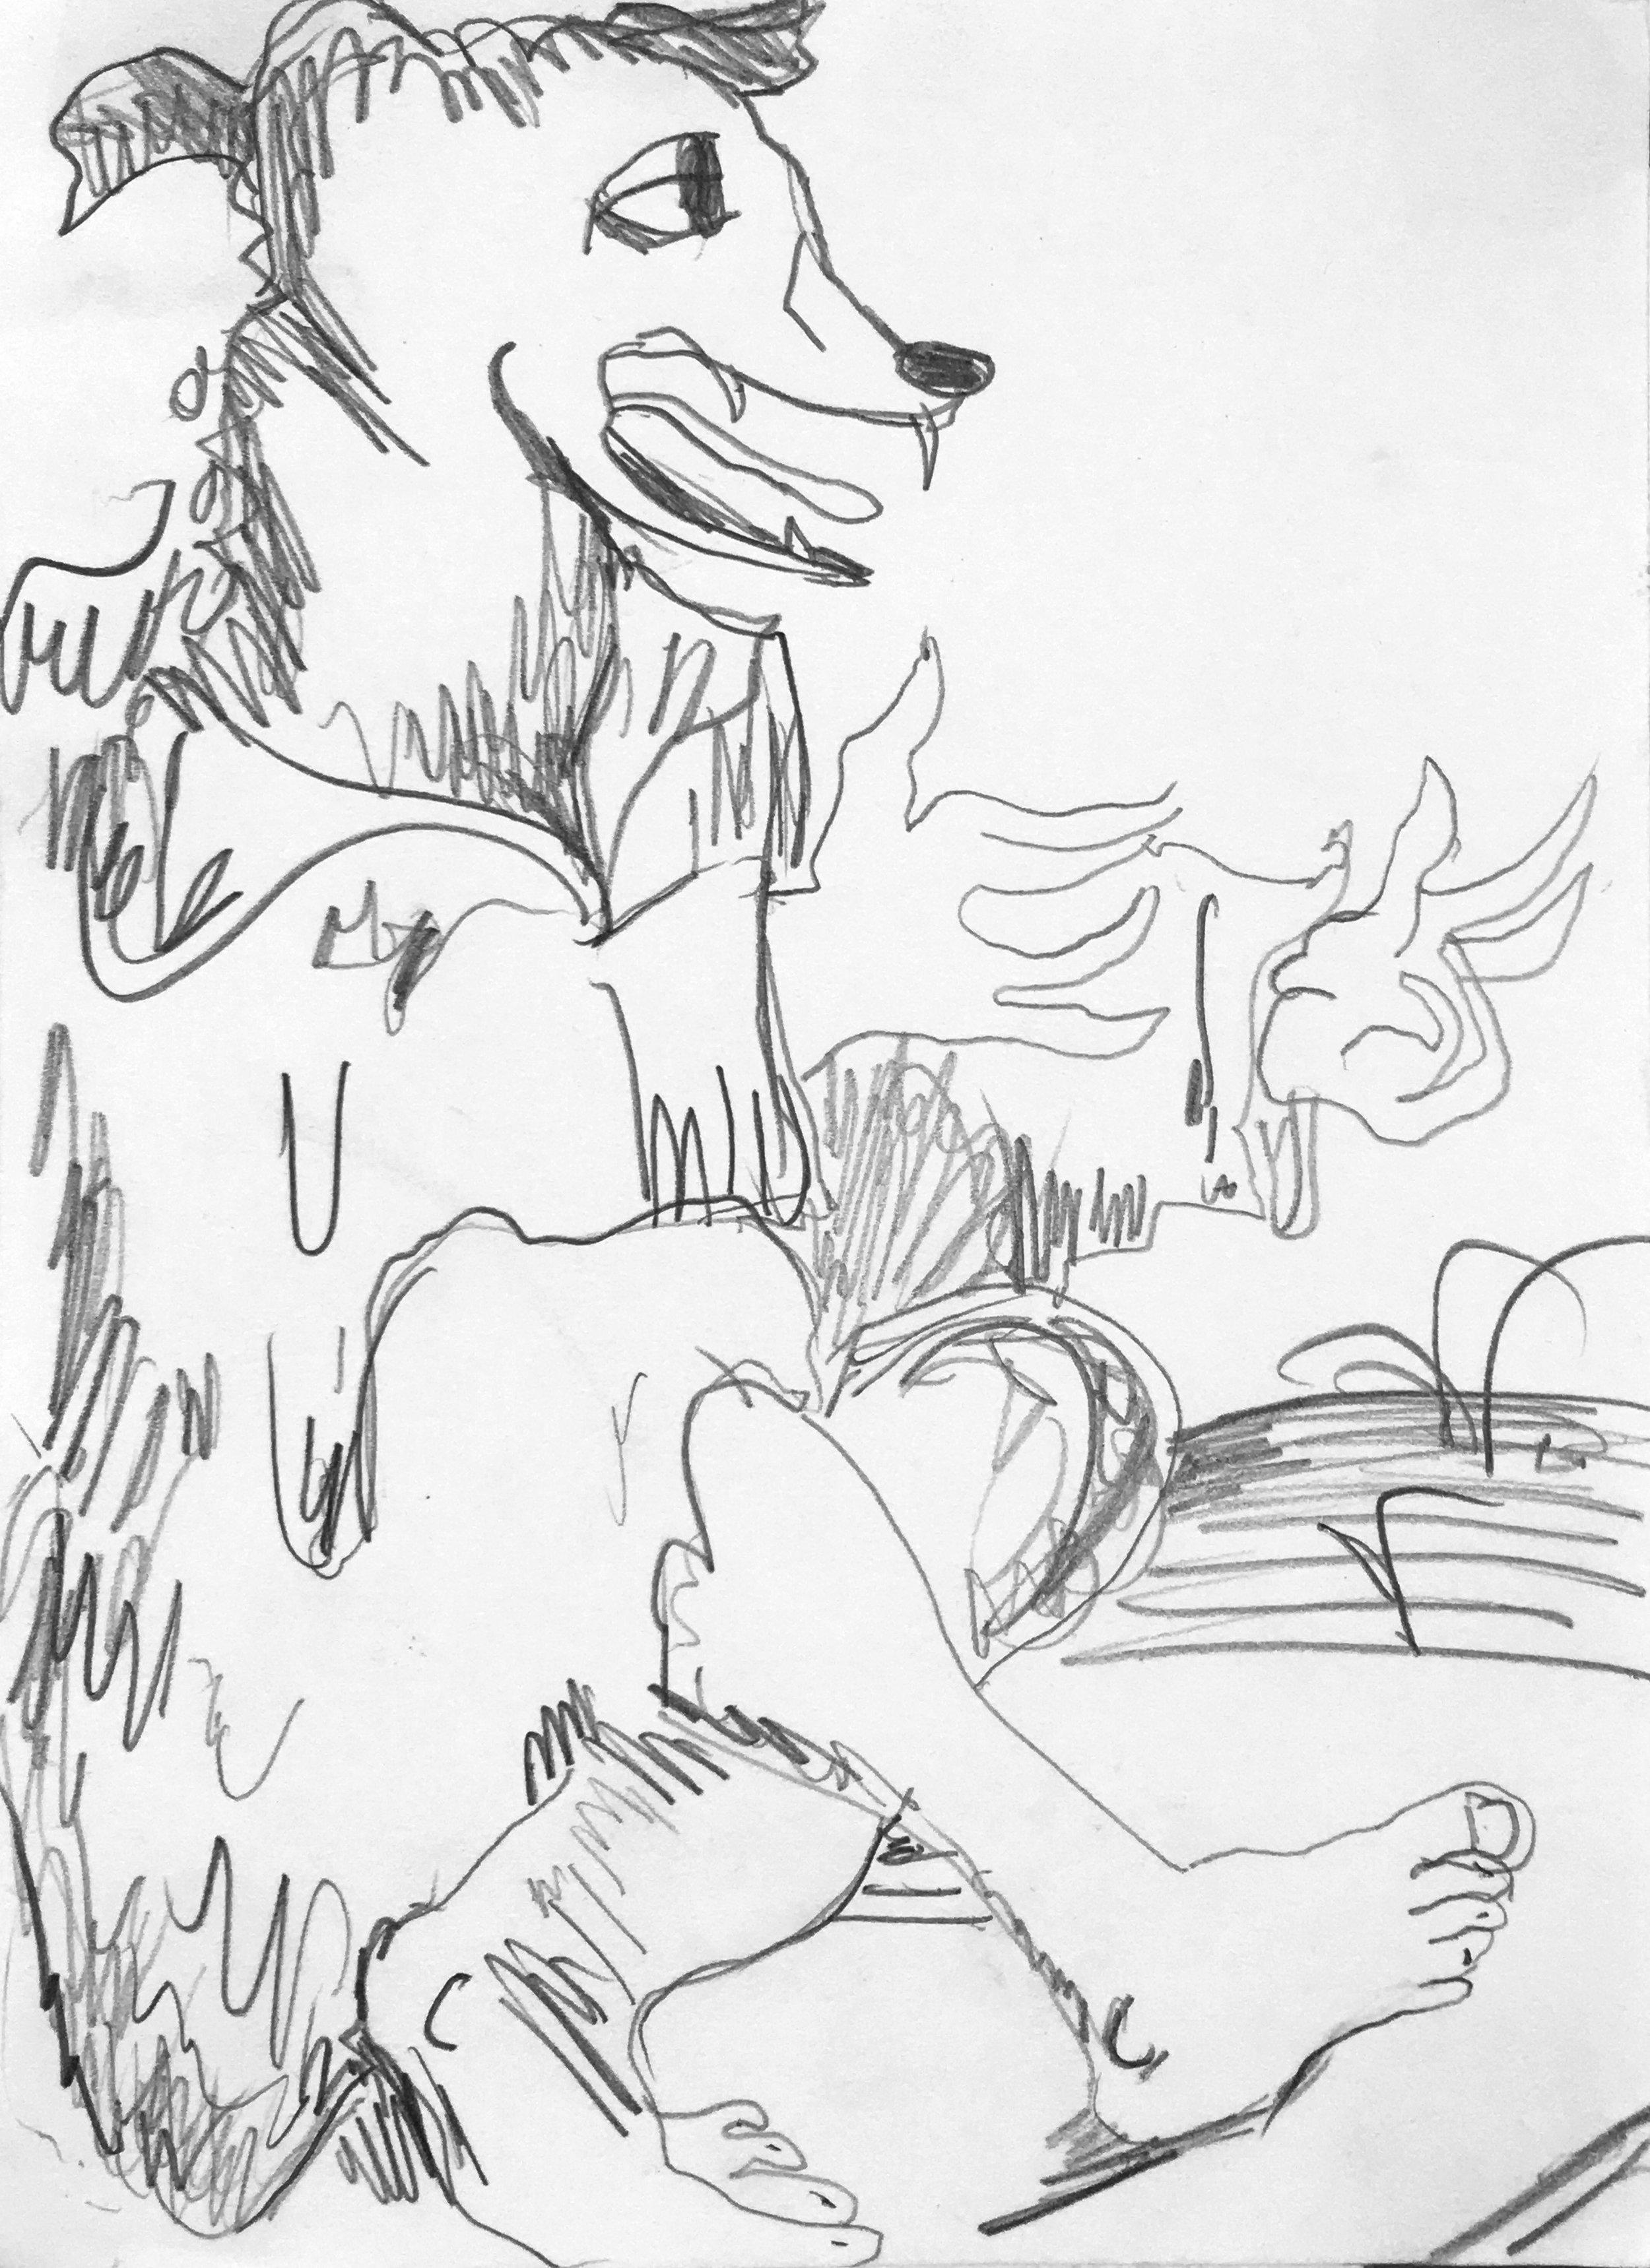 "Dog Man, pencil on paper, 8"" x 6"", 2016"